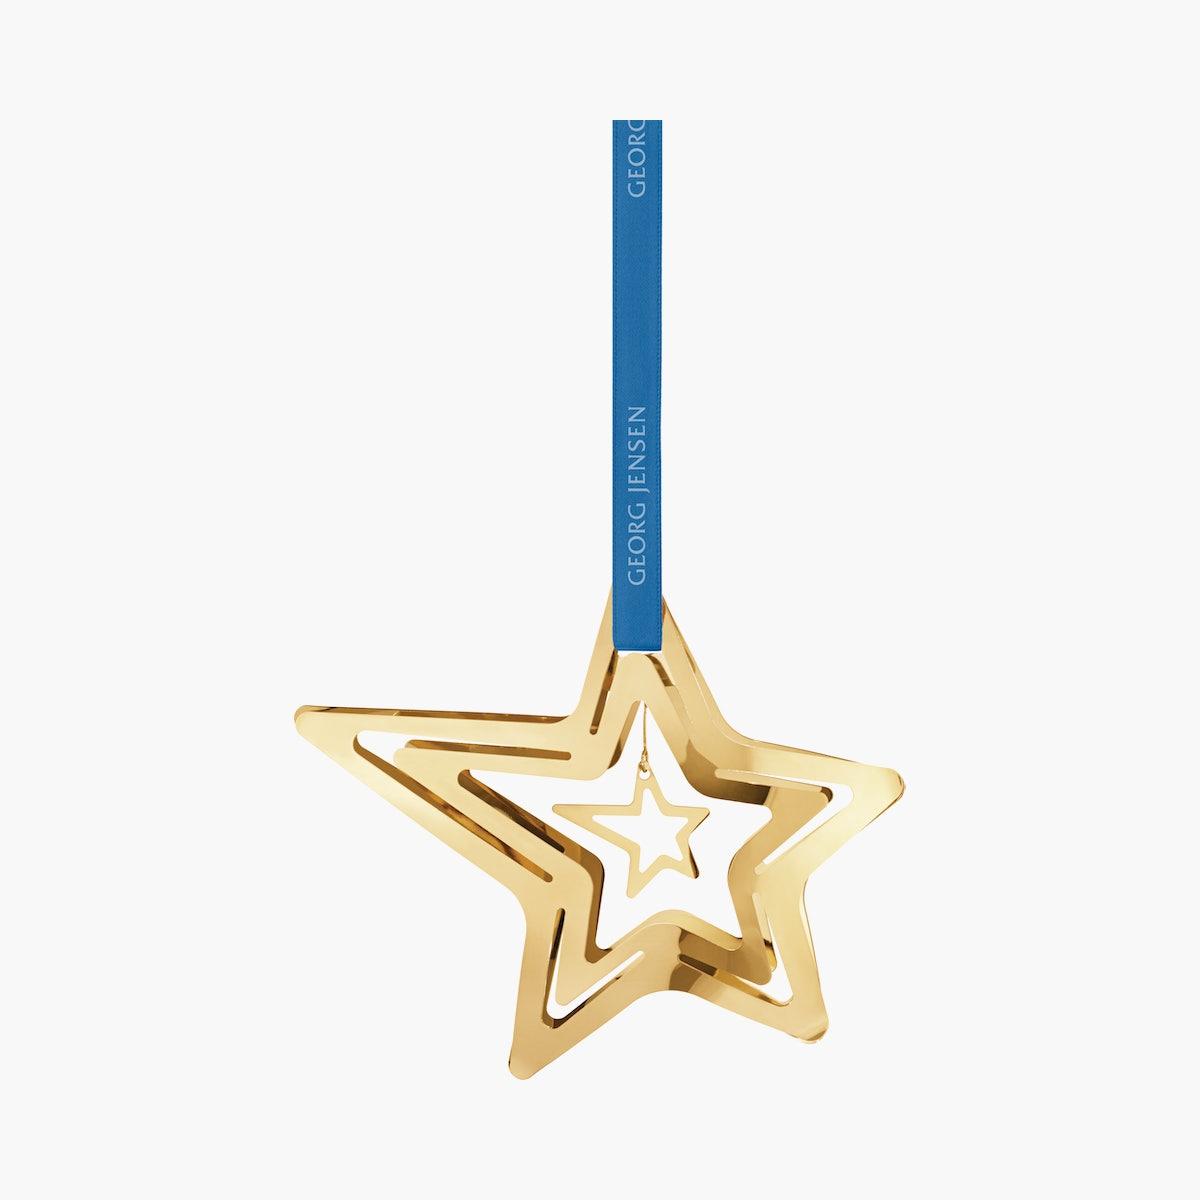 Georg Jensen Star Ornaments, 5 Point